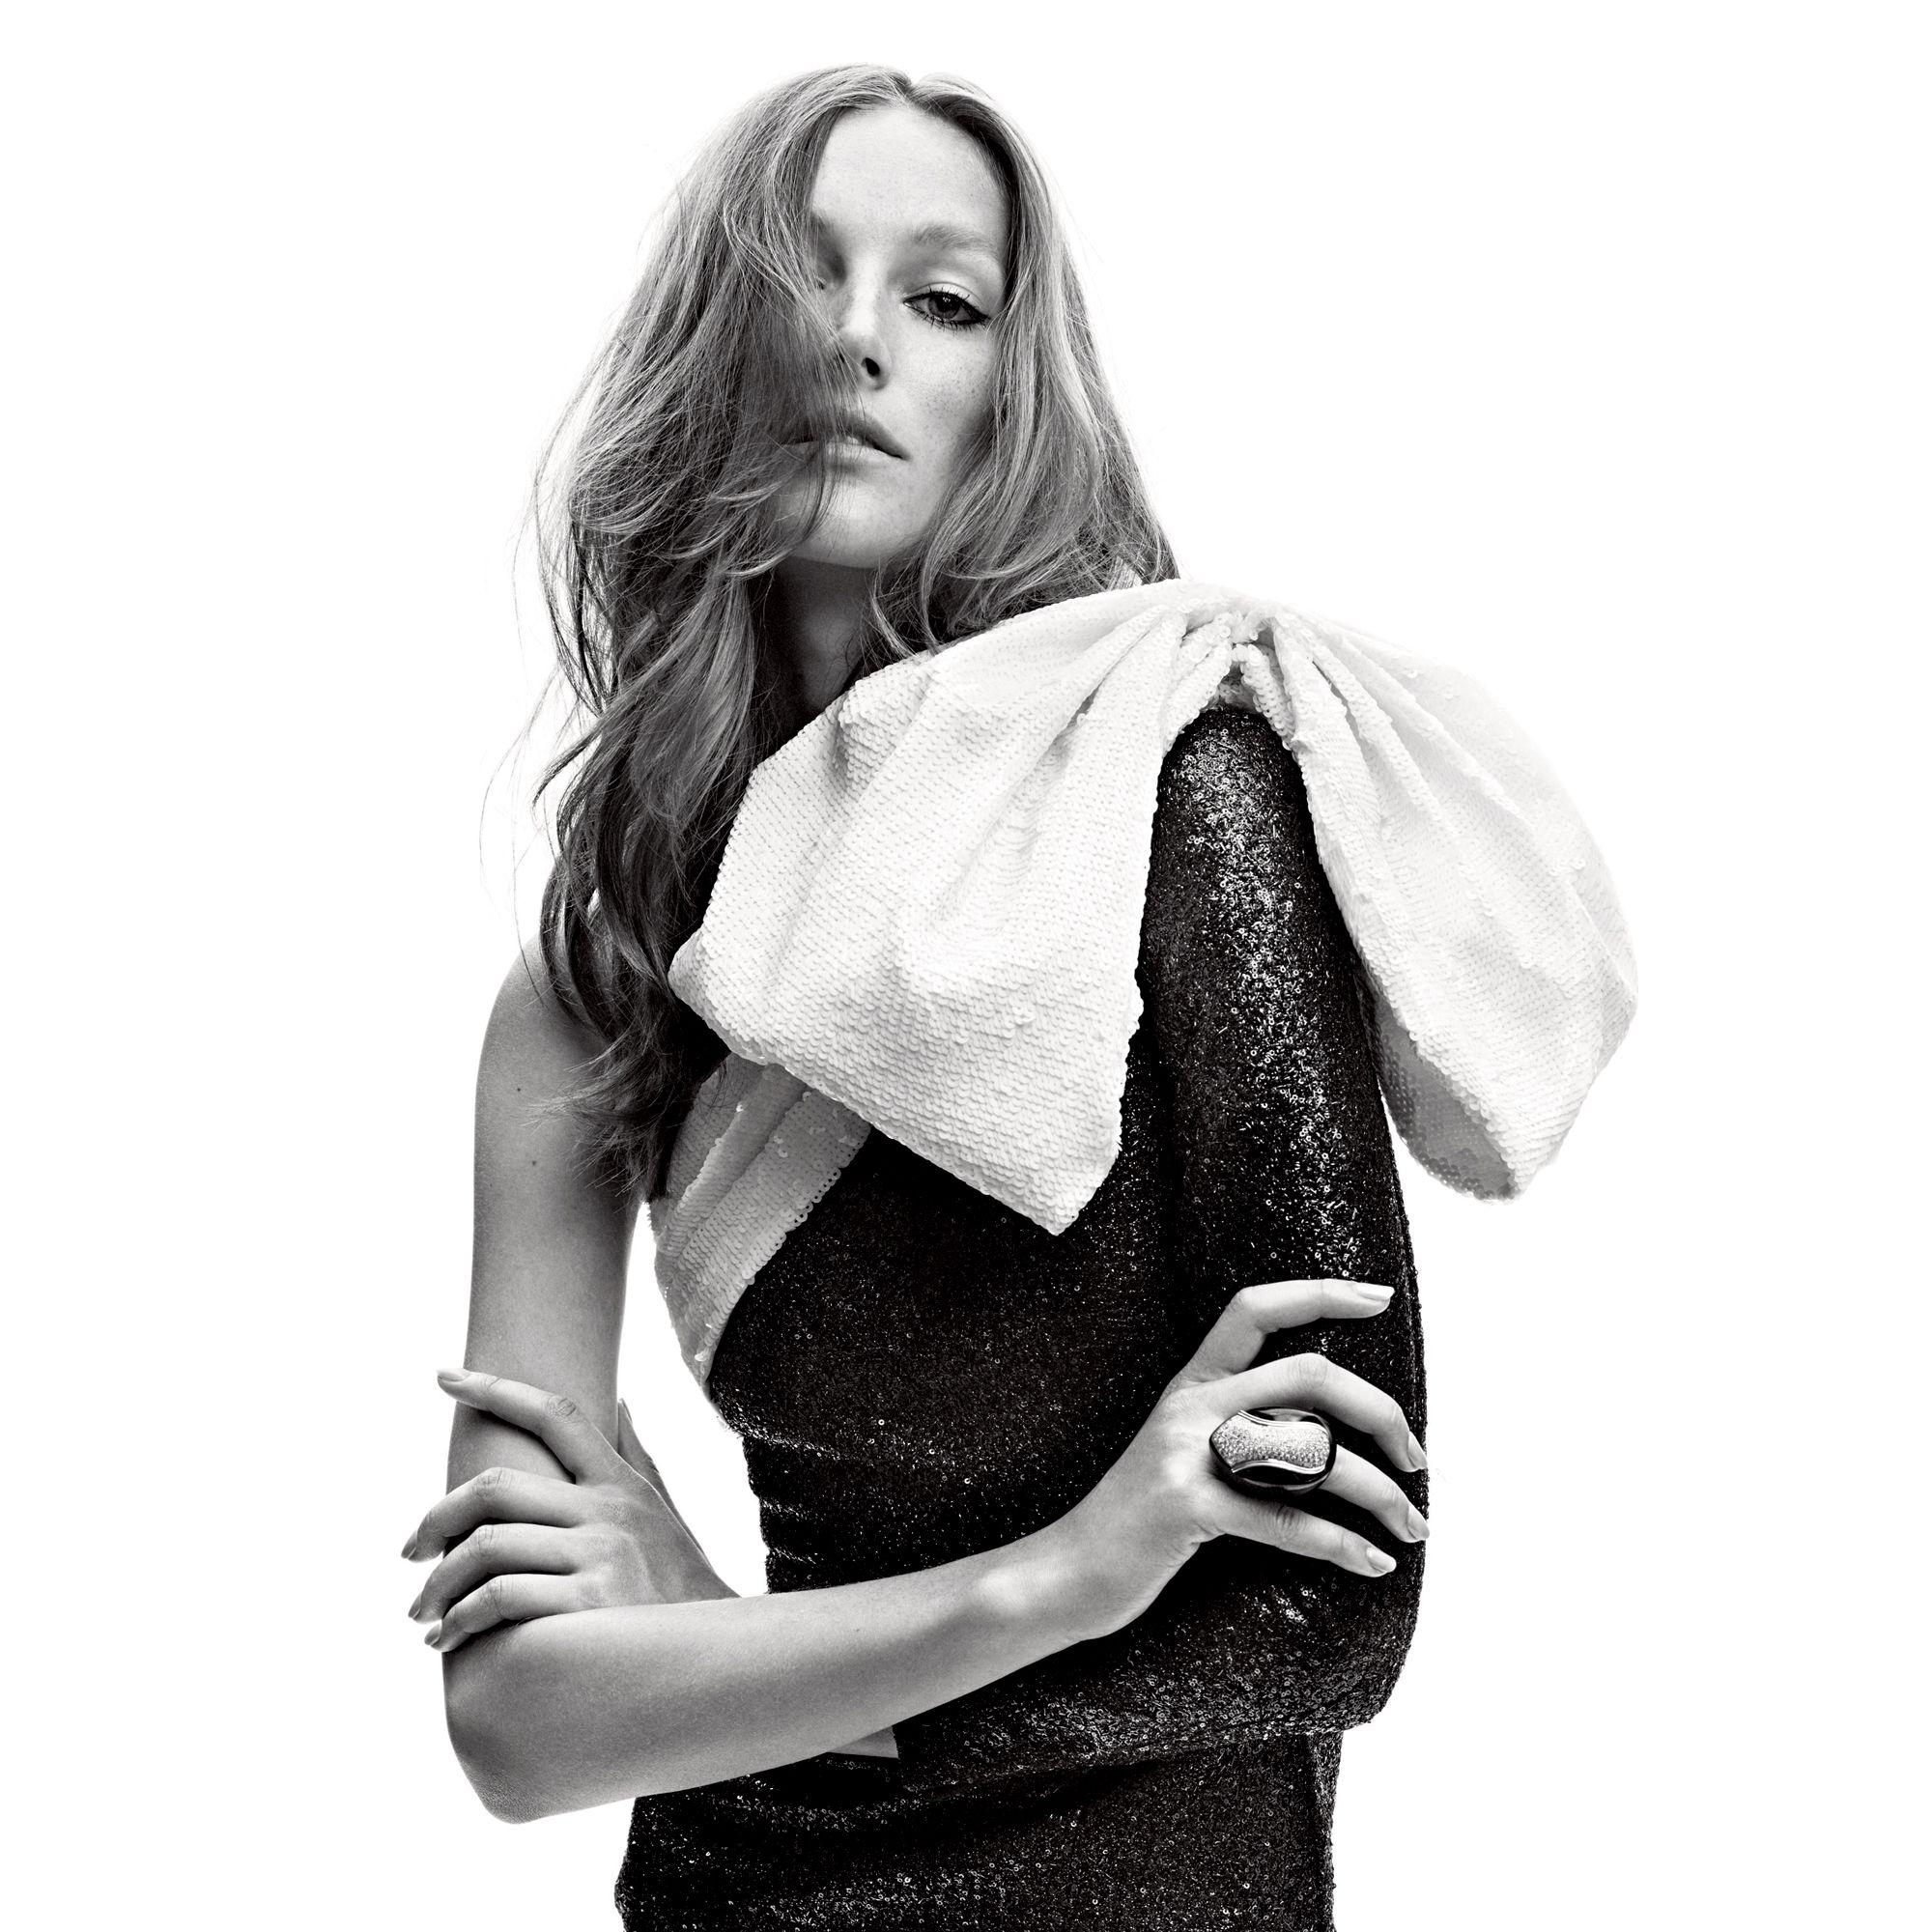 "<p><strong>Saint Laurent by Hedi Silmane </strong>dress, price upon request, 212-980-2970&#x3B; <strong>Jill Heller</strong> ring, $7,500, <a href=""https://shop.harpersbazaar.com/"" target=""_blank"">shopBAZAAR.com</a>.</p><p><br></p>"